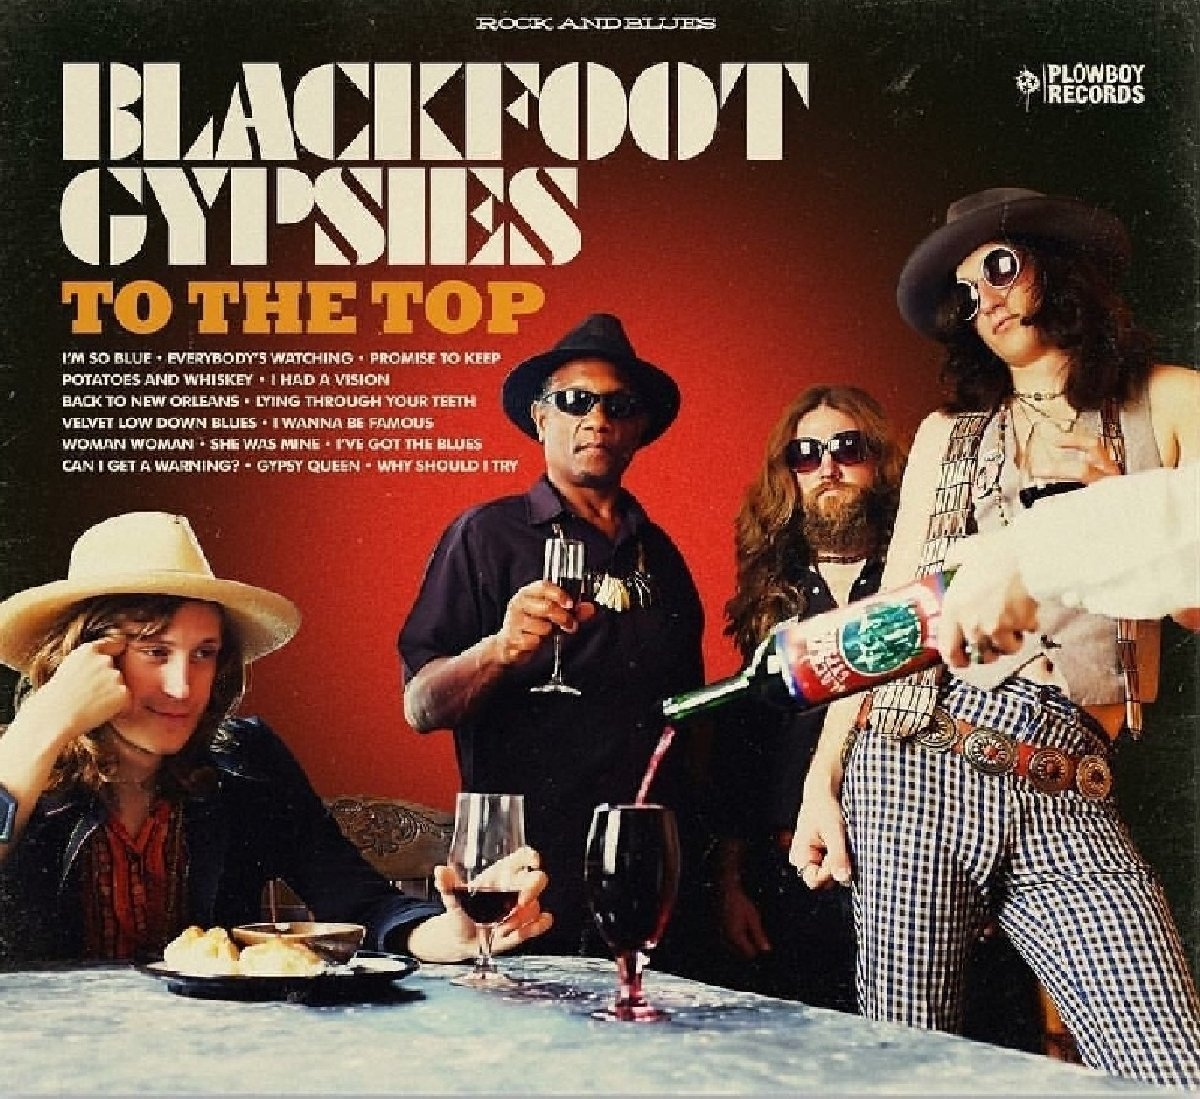 blackfoot gypsies to the top american songwriter